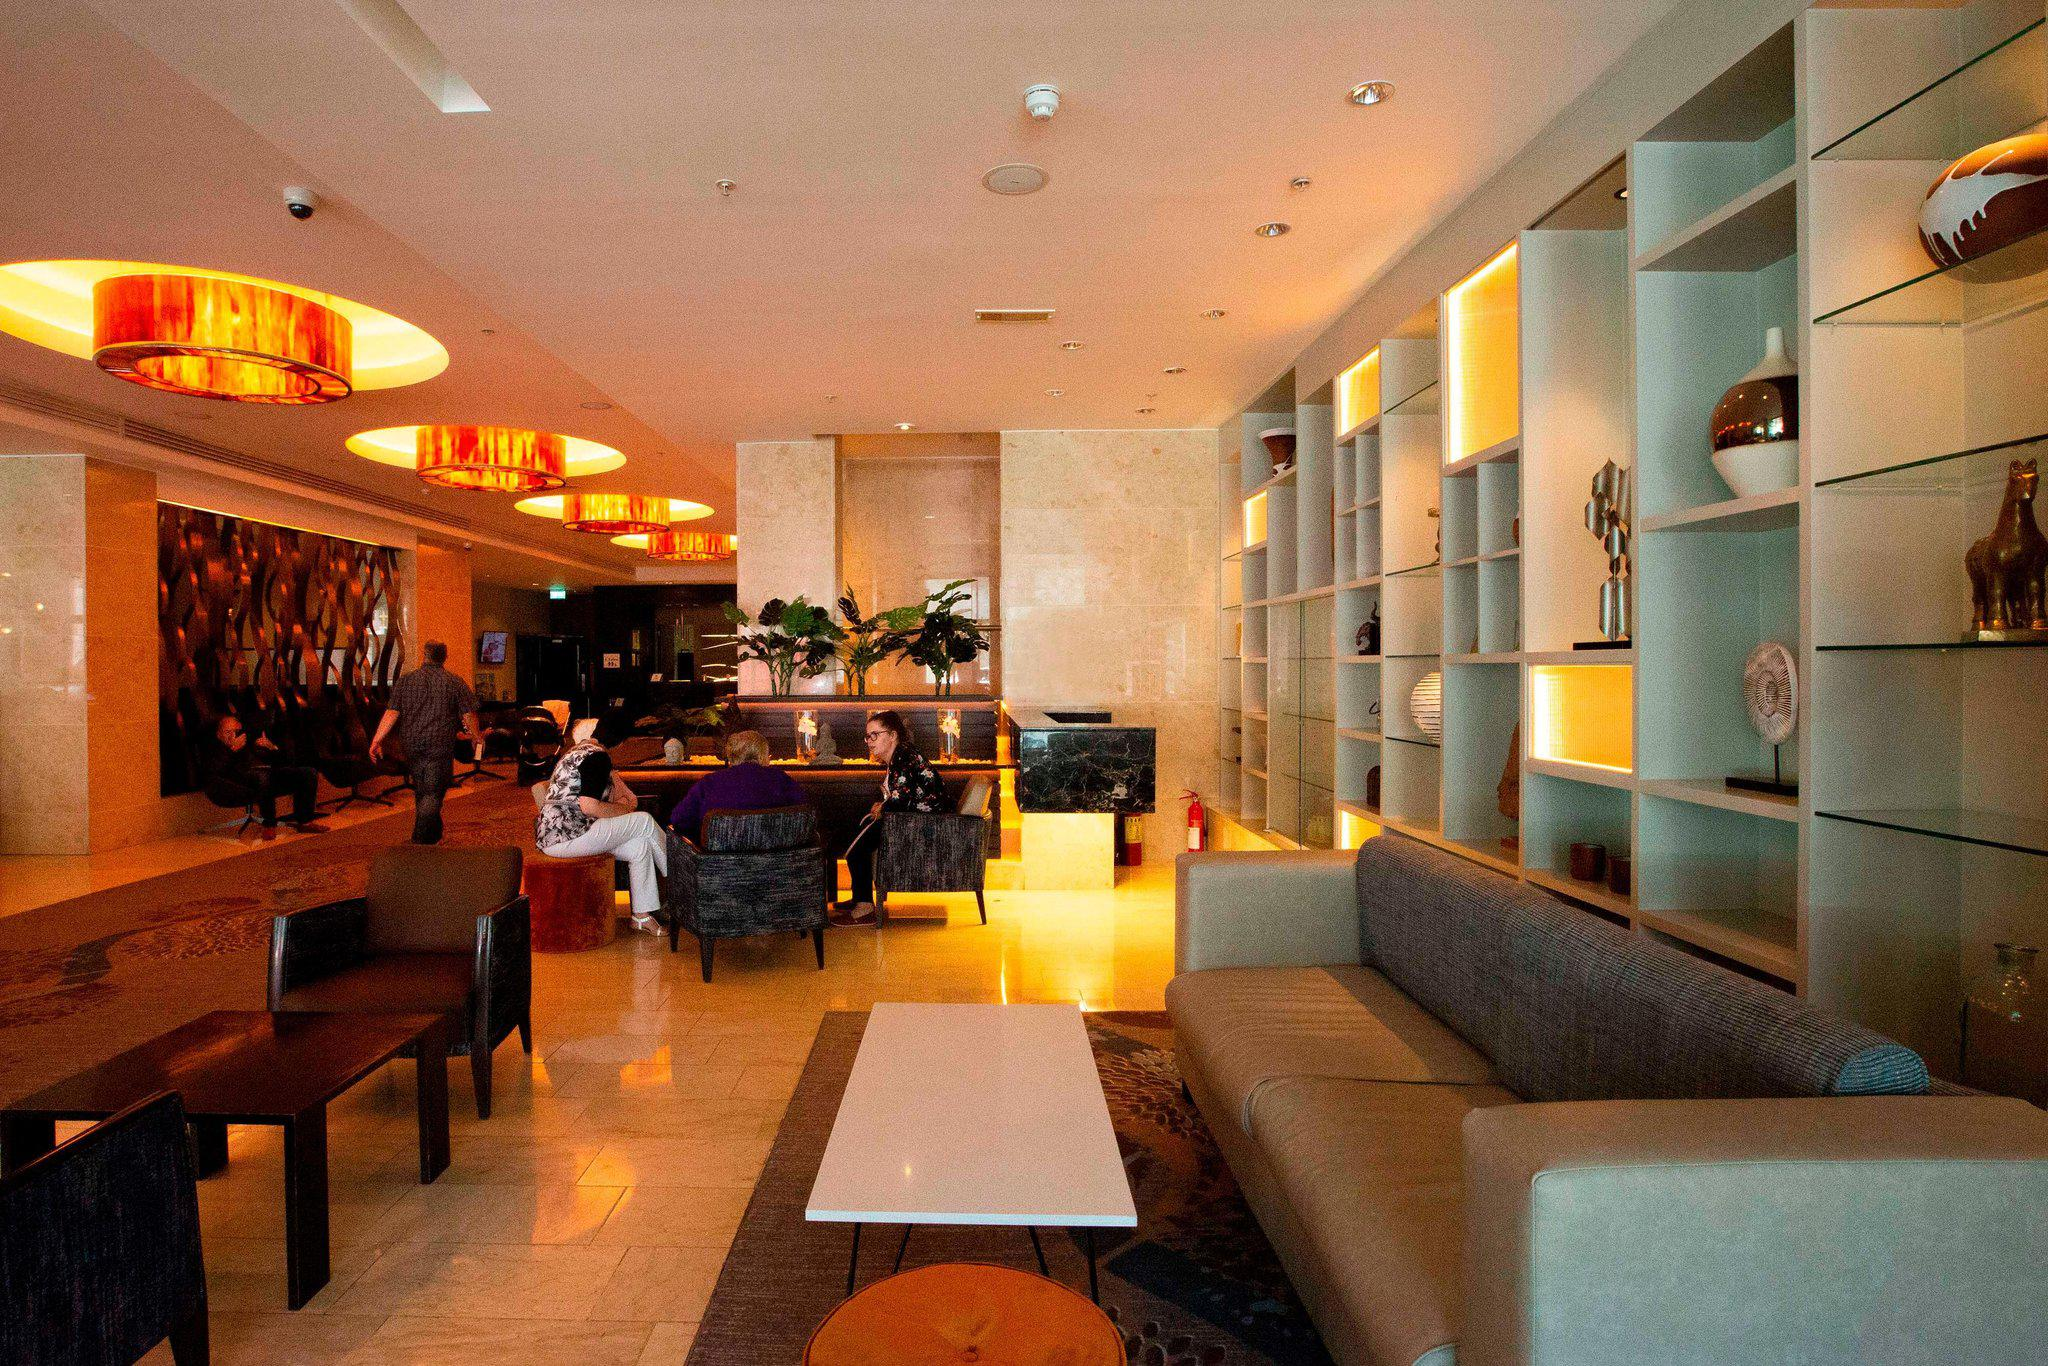 Sheraton Athlone Hotel 4